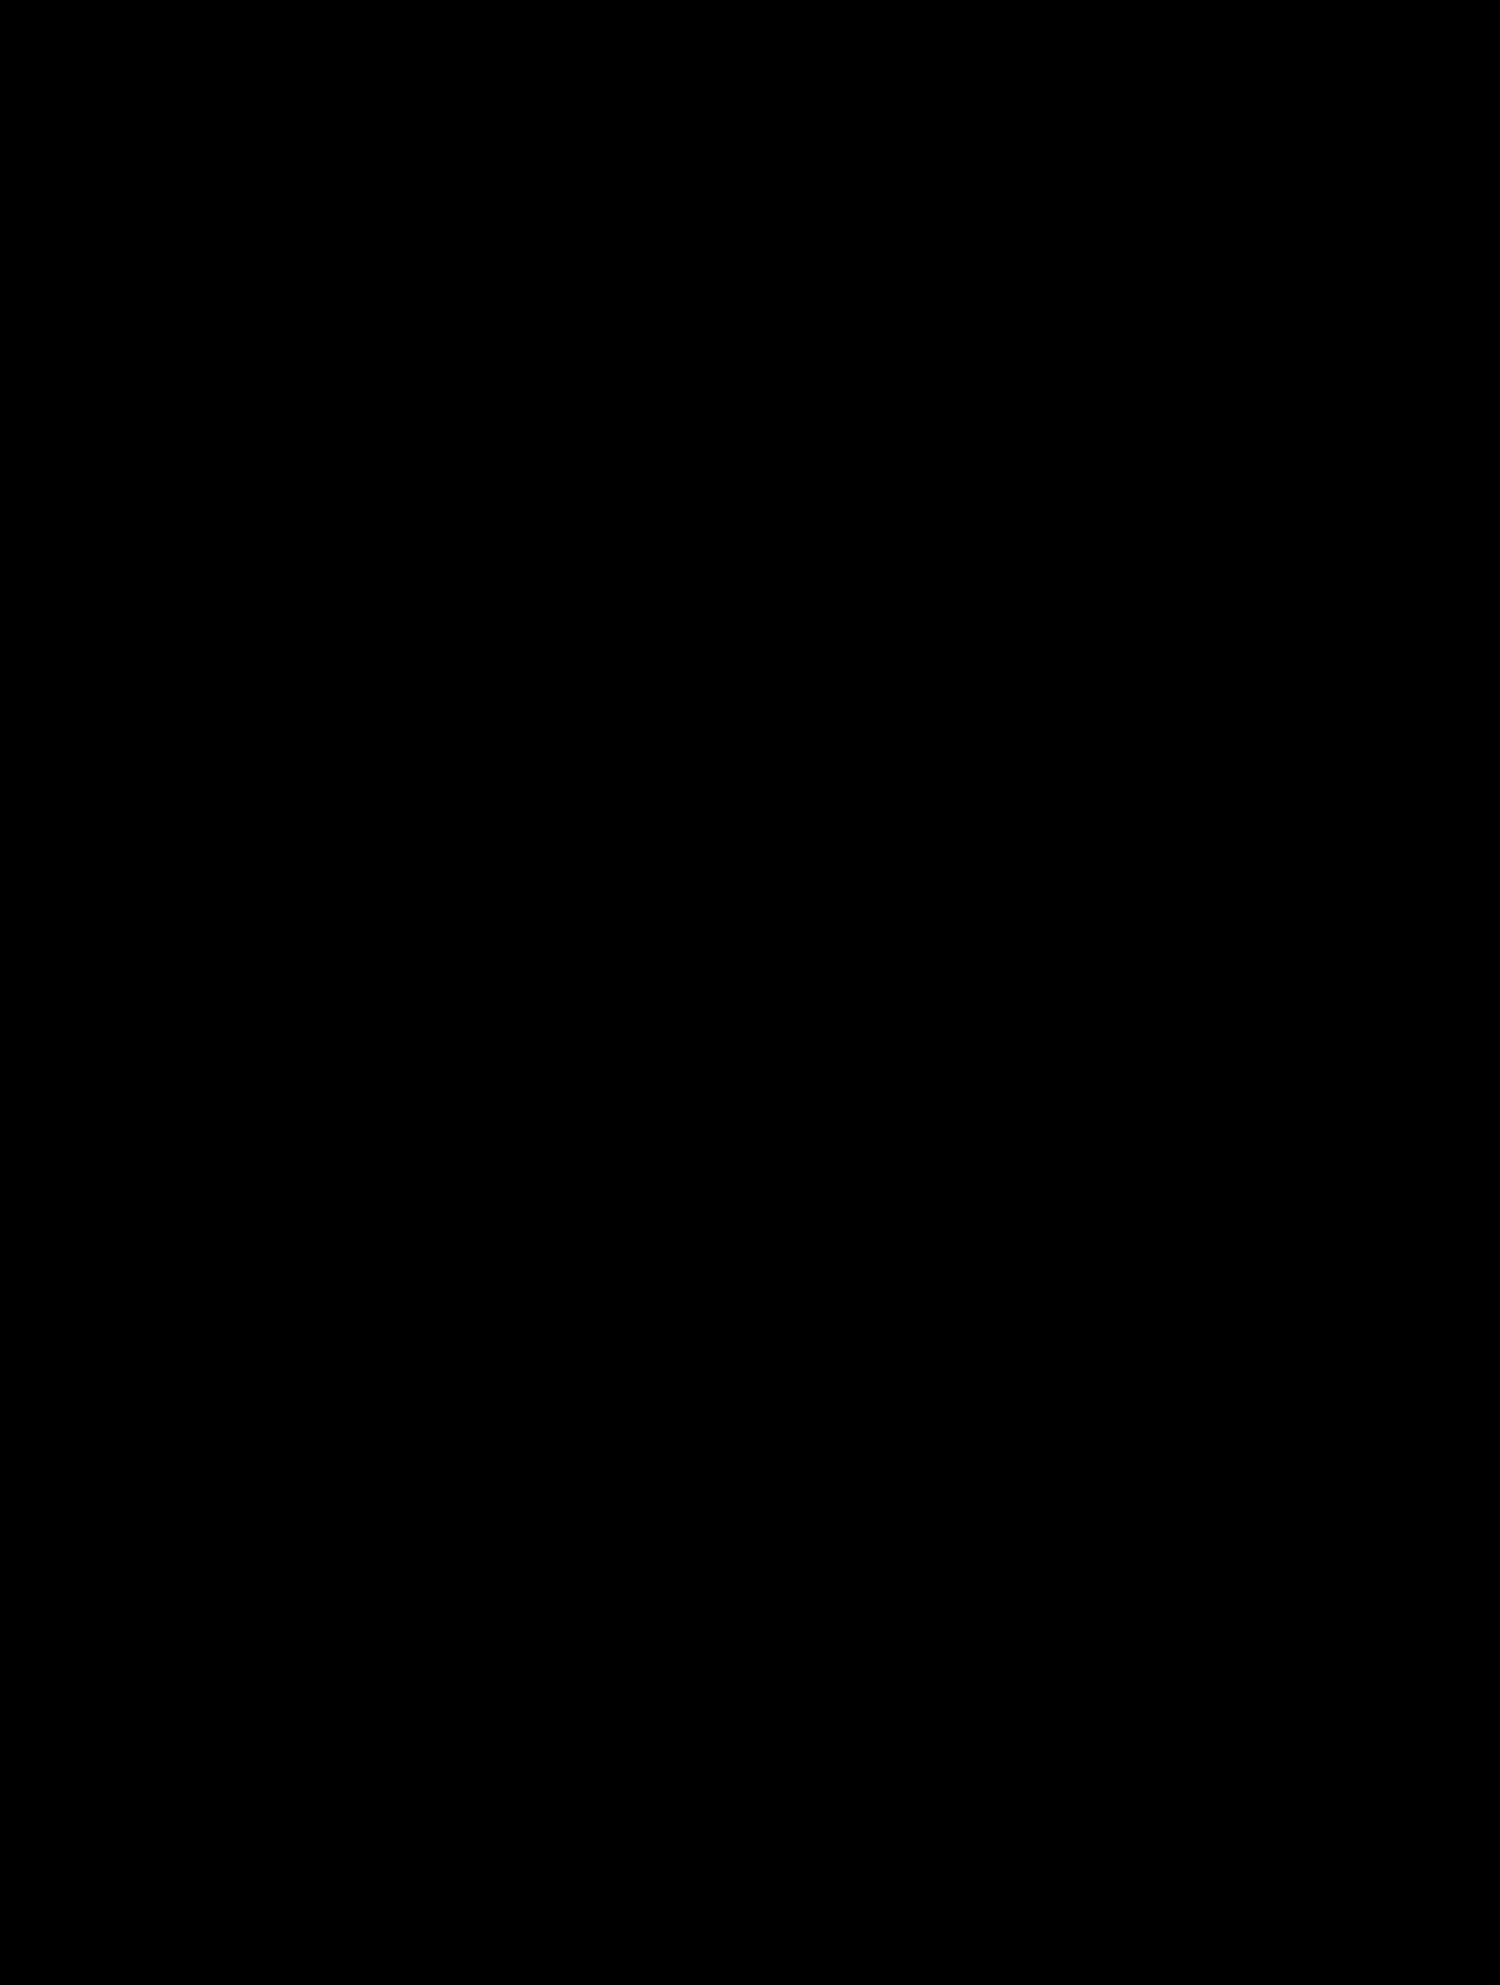 7 black tree png image transparent onlygfxcom